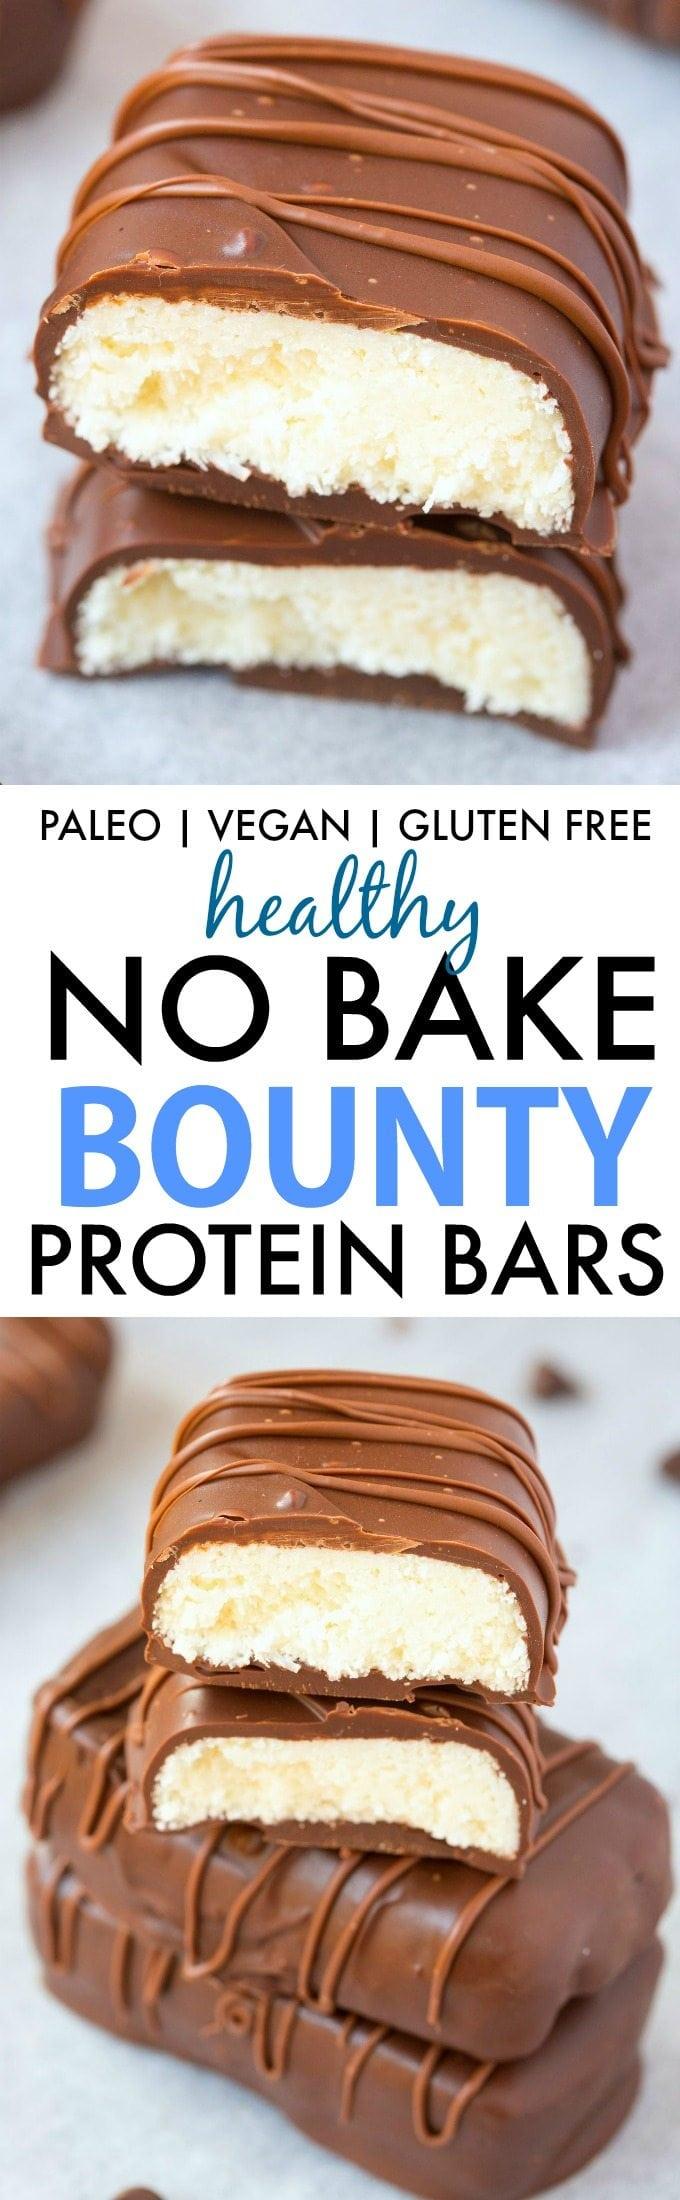 Homemade No Bake Bounty Protein Bars (Paleo, Vegan, Gluten ...